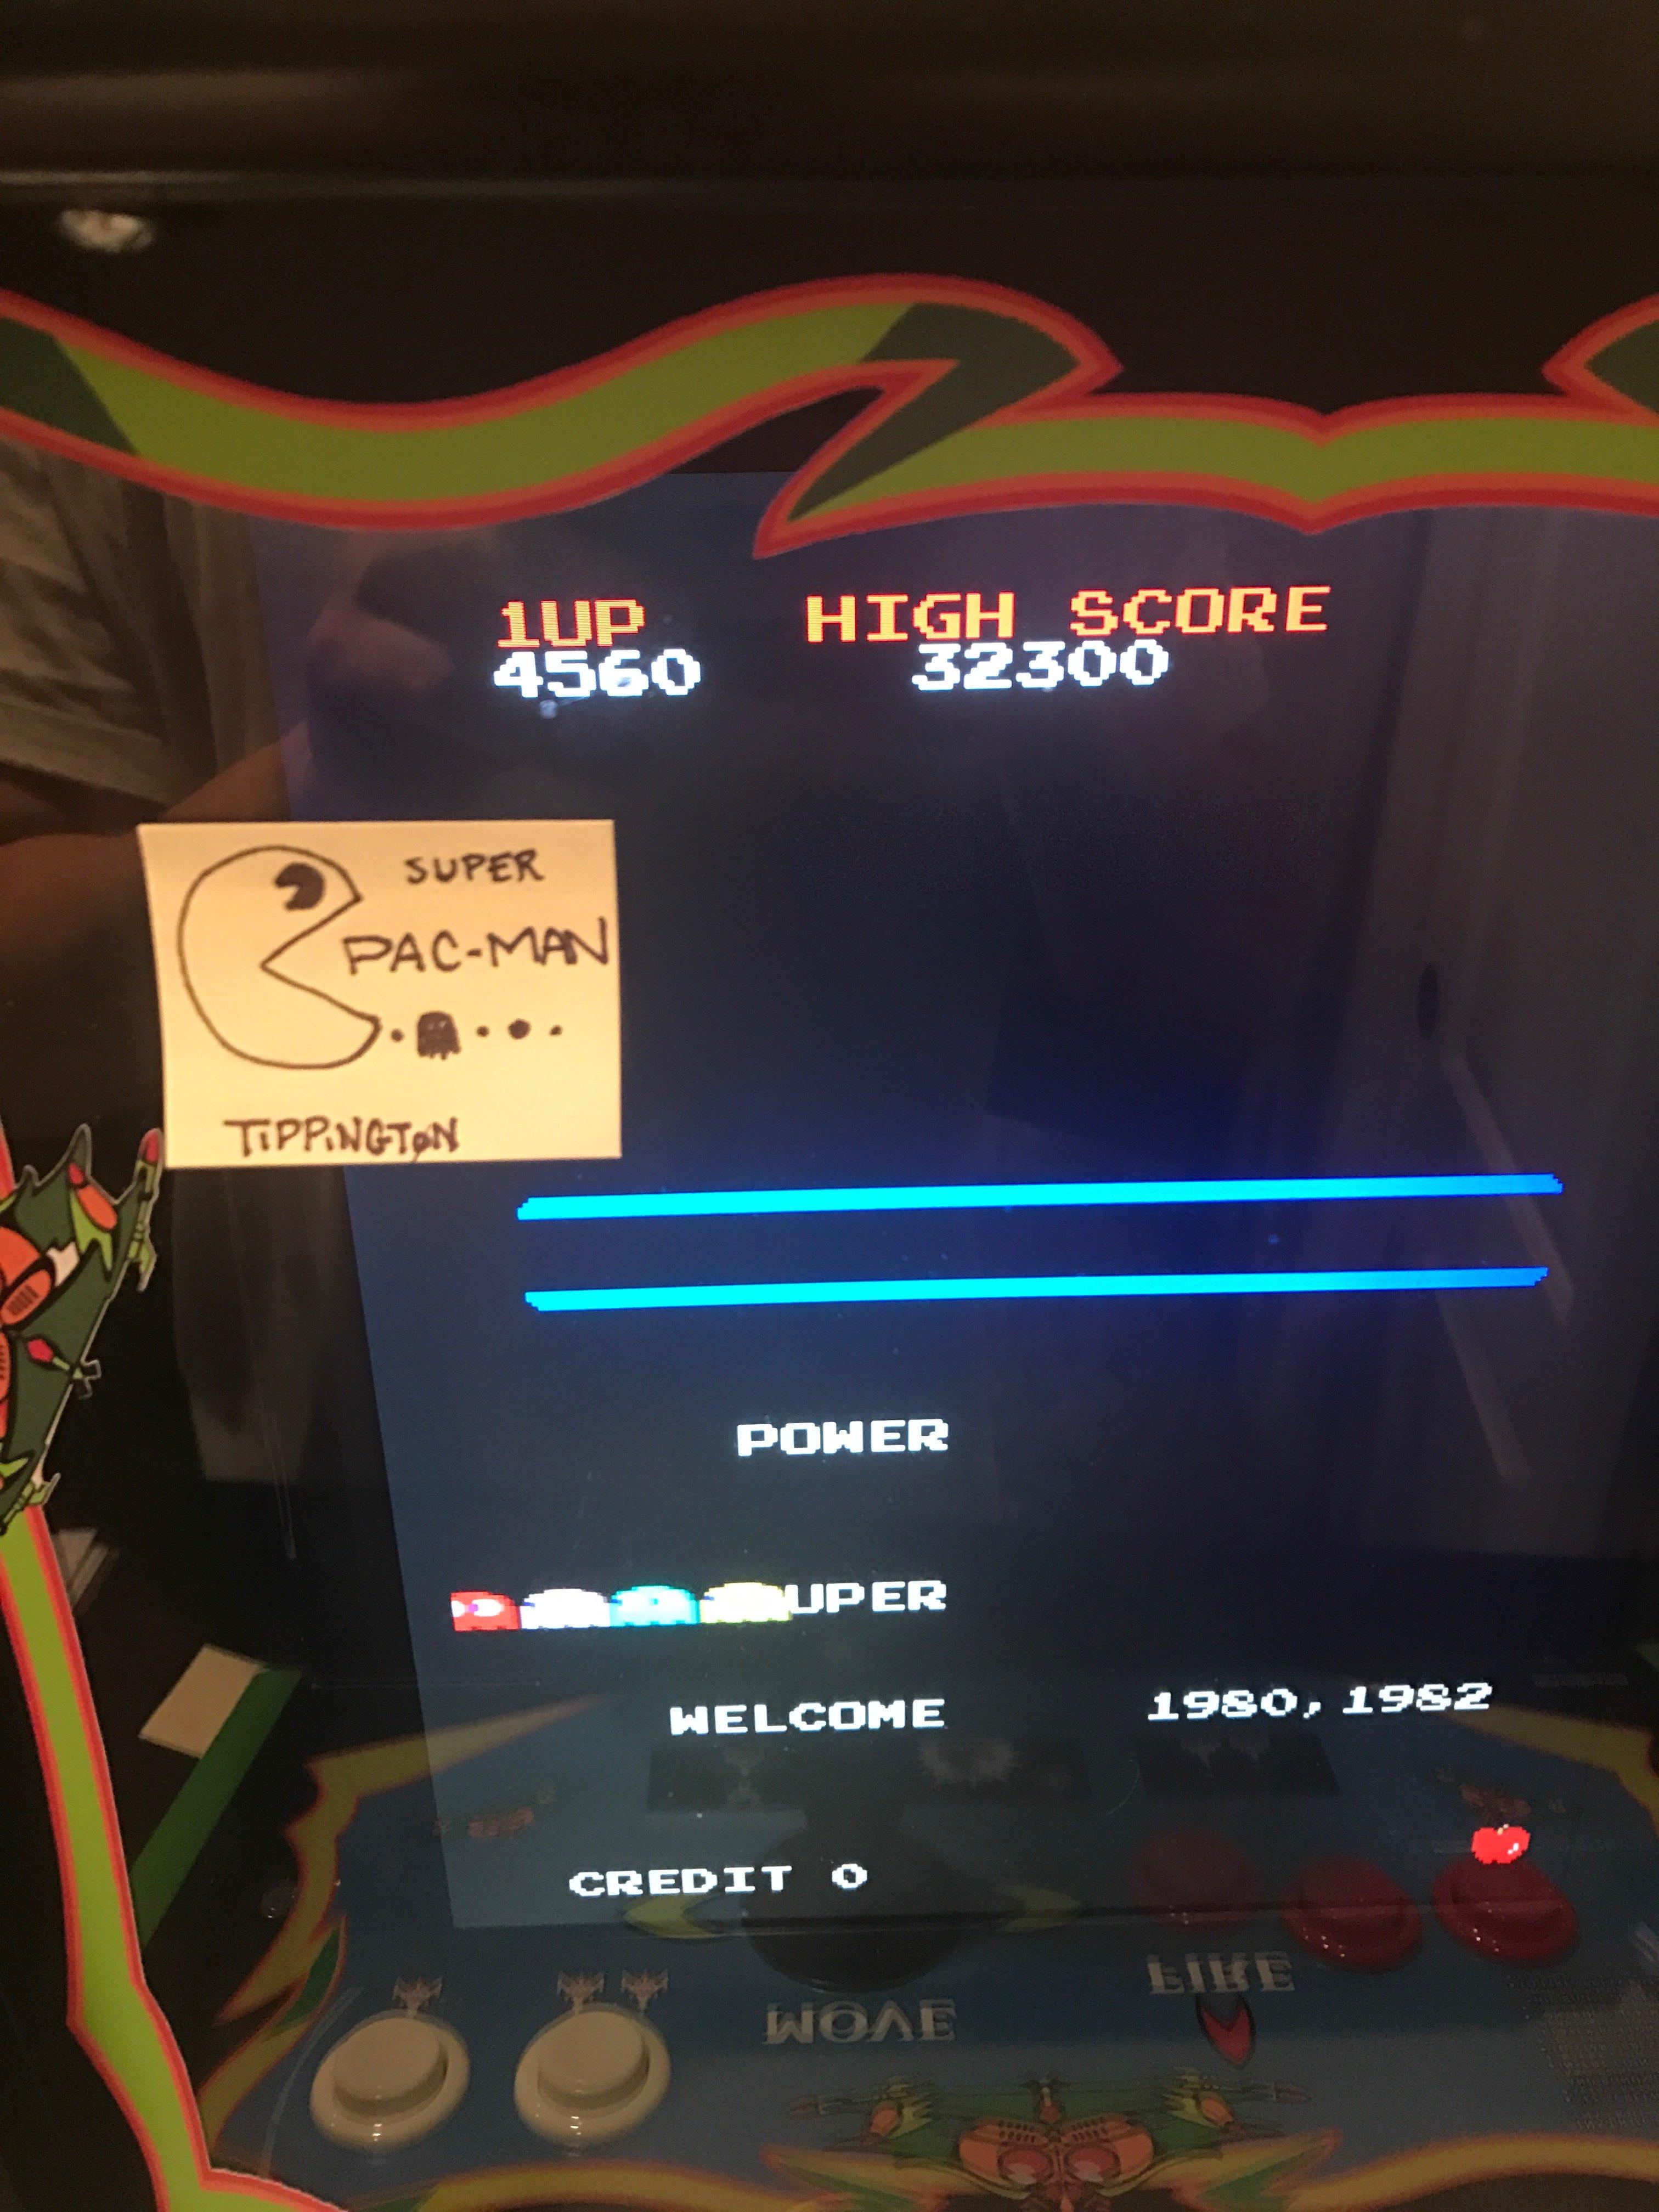 tippington: Super Pac-Man (Arcade Emulated / M.A.M.E.) 32,300 points on 2017-02-04 00:08:42